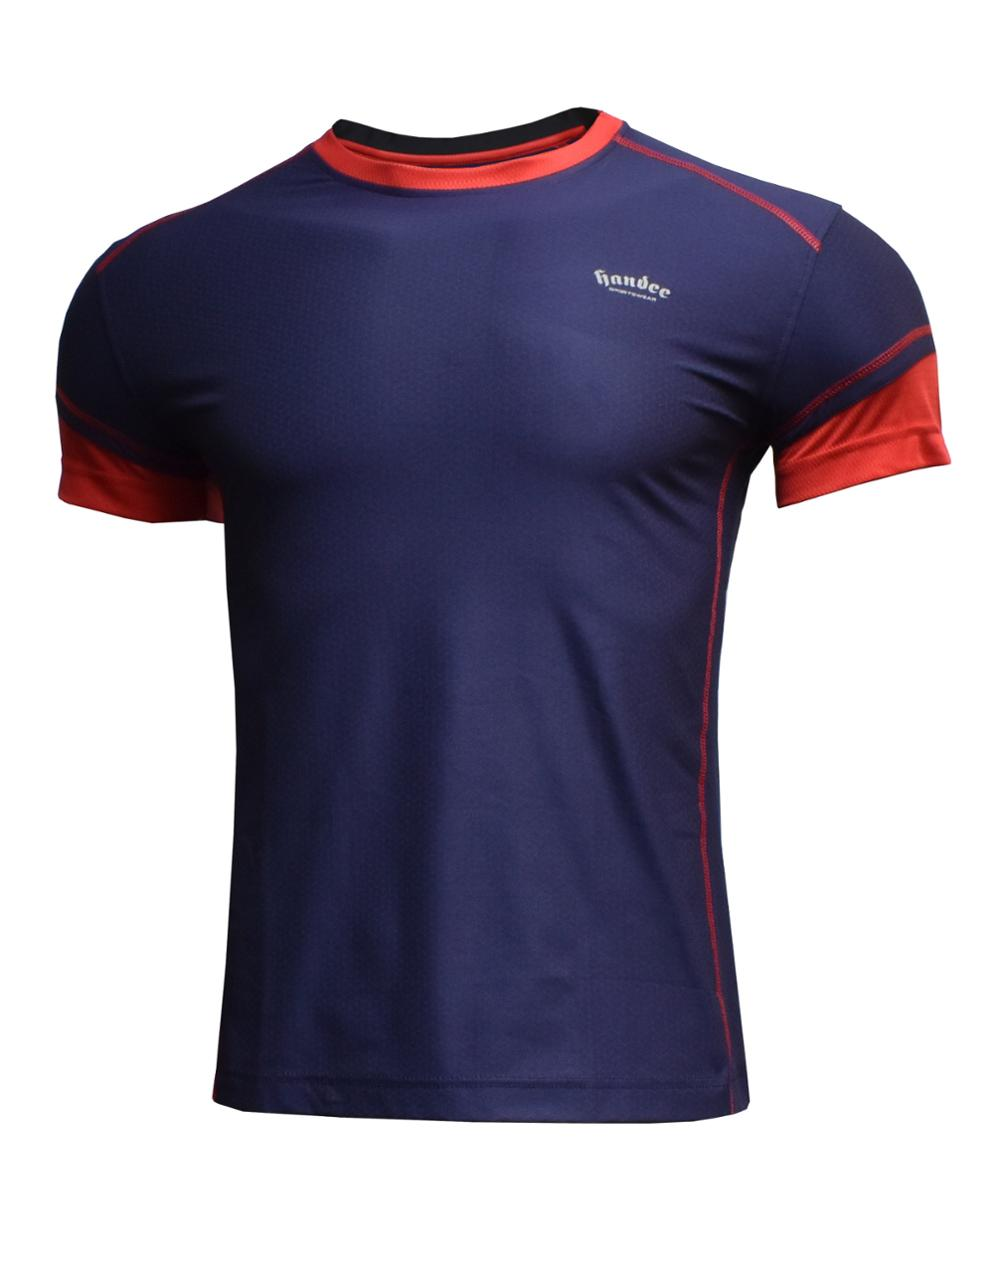 vietnam sportswear manufacturer vietnam t shirt manufacturer